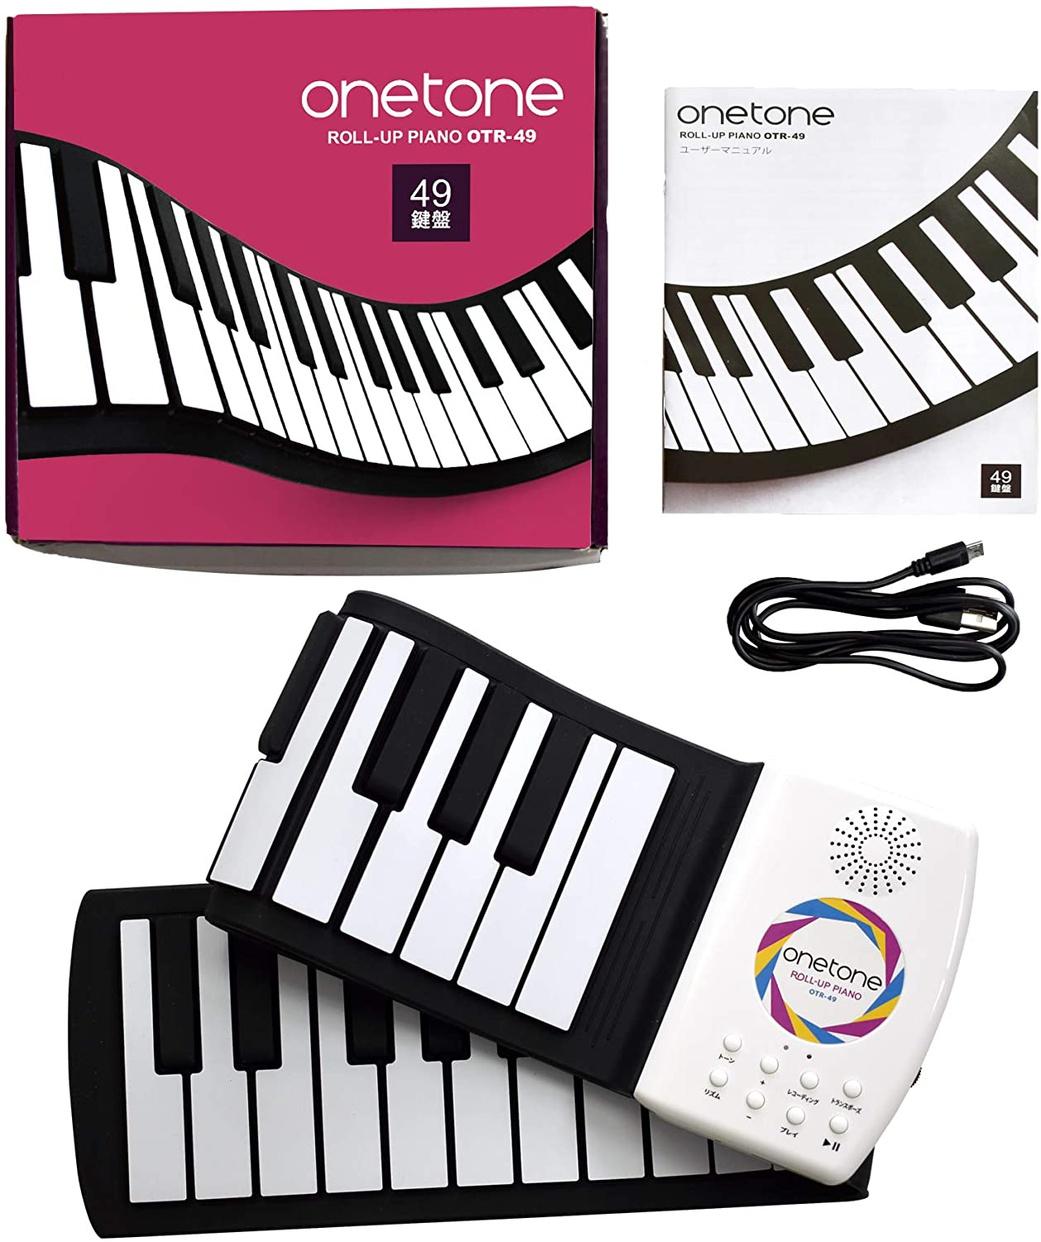 ONETONE(ワントーン) 49鍵盤ロールピアノ OTR-49の商品画像